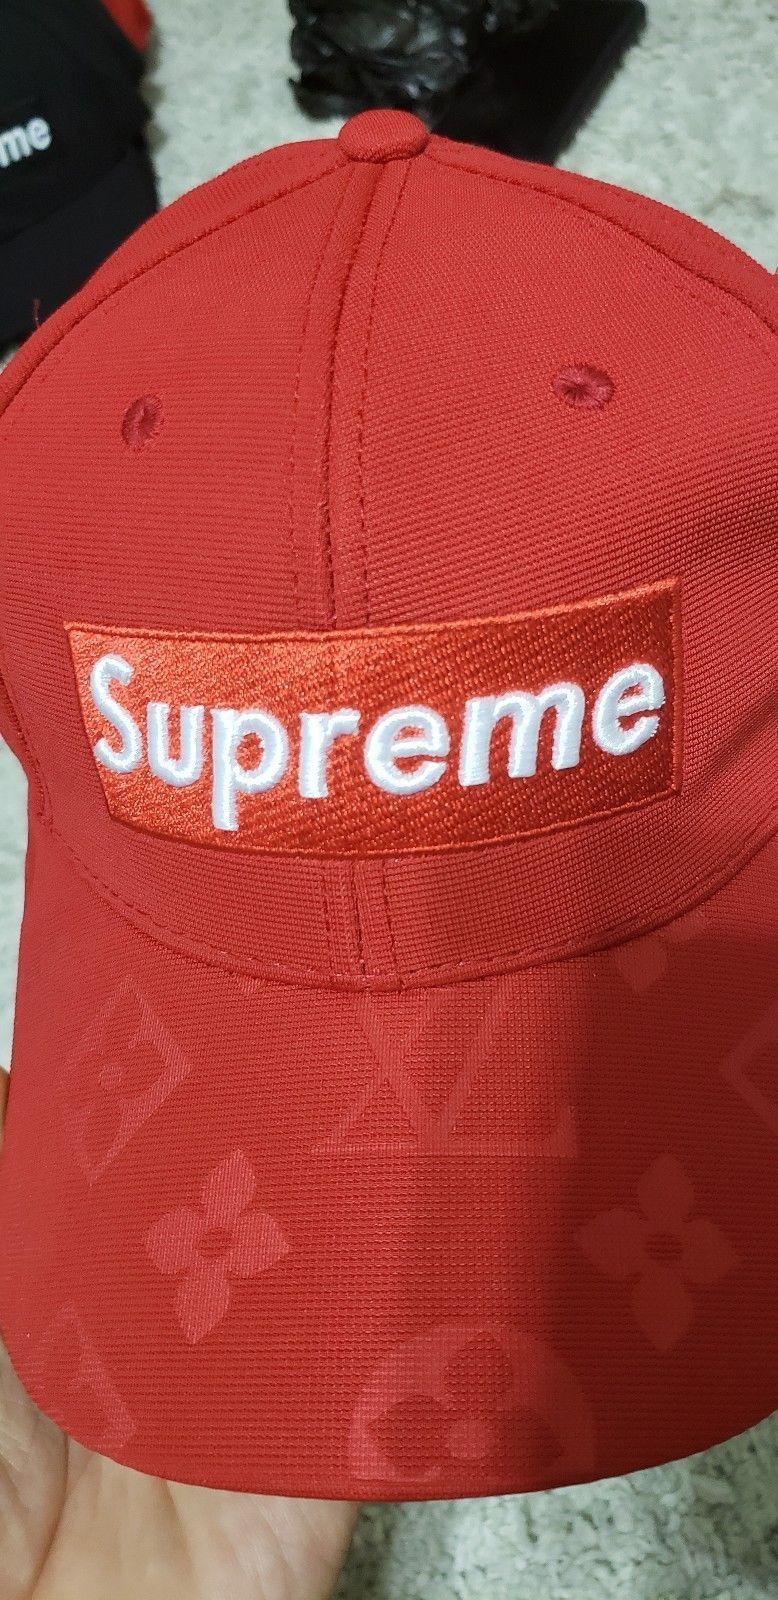 SUPREME HOLOGRAPHIC CAMP CAP RED SS19 2019 HAT BLACK YELLOW WHITE BOX LOGO CDG